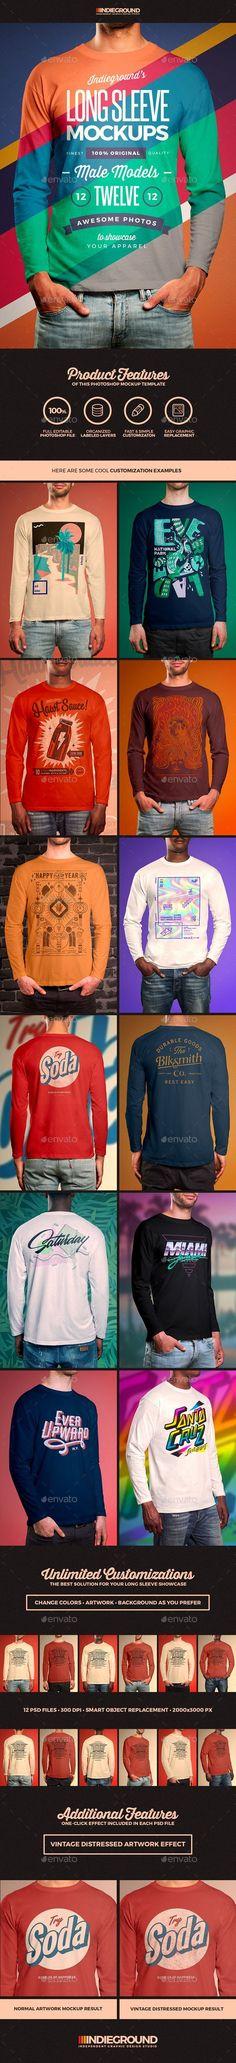 Men Long Sleeve T-Shirt Mockups - Apparel #Product #Mock-Ups Download here:  https://graphicriver.net/item/men-long-sleeve-tshirt-mockups/19758057?ref=alena994